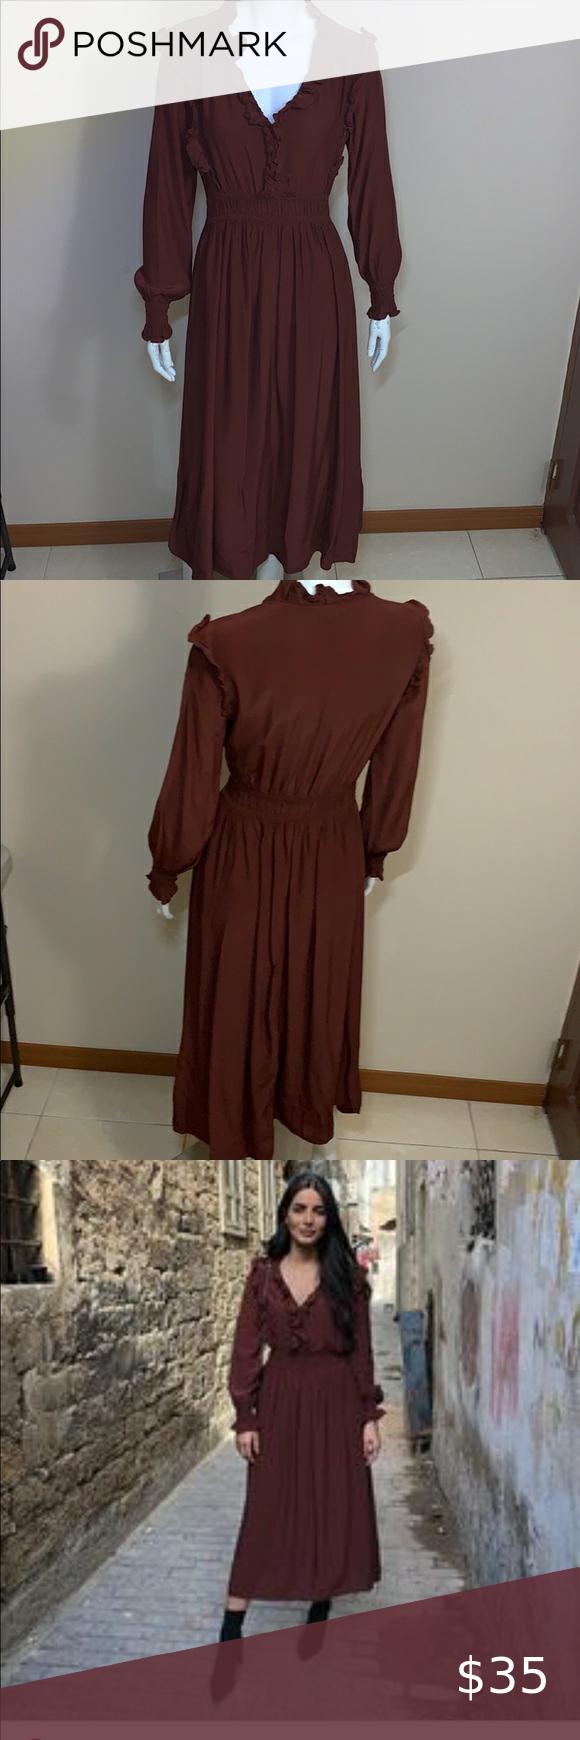 H M Dark Brick Red Dress With Smocking Orange Maxi Dress Snake Print Maxi Dress Maxi Dress With Sleeves [ 1740 x 580 Pixel ]